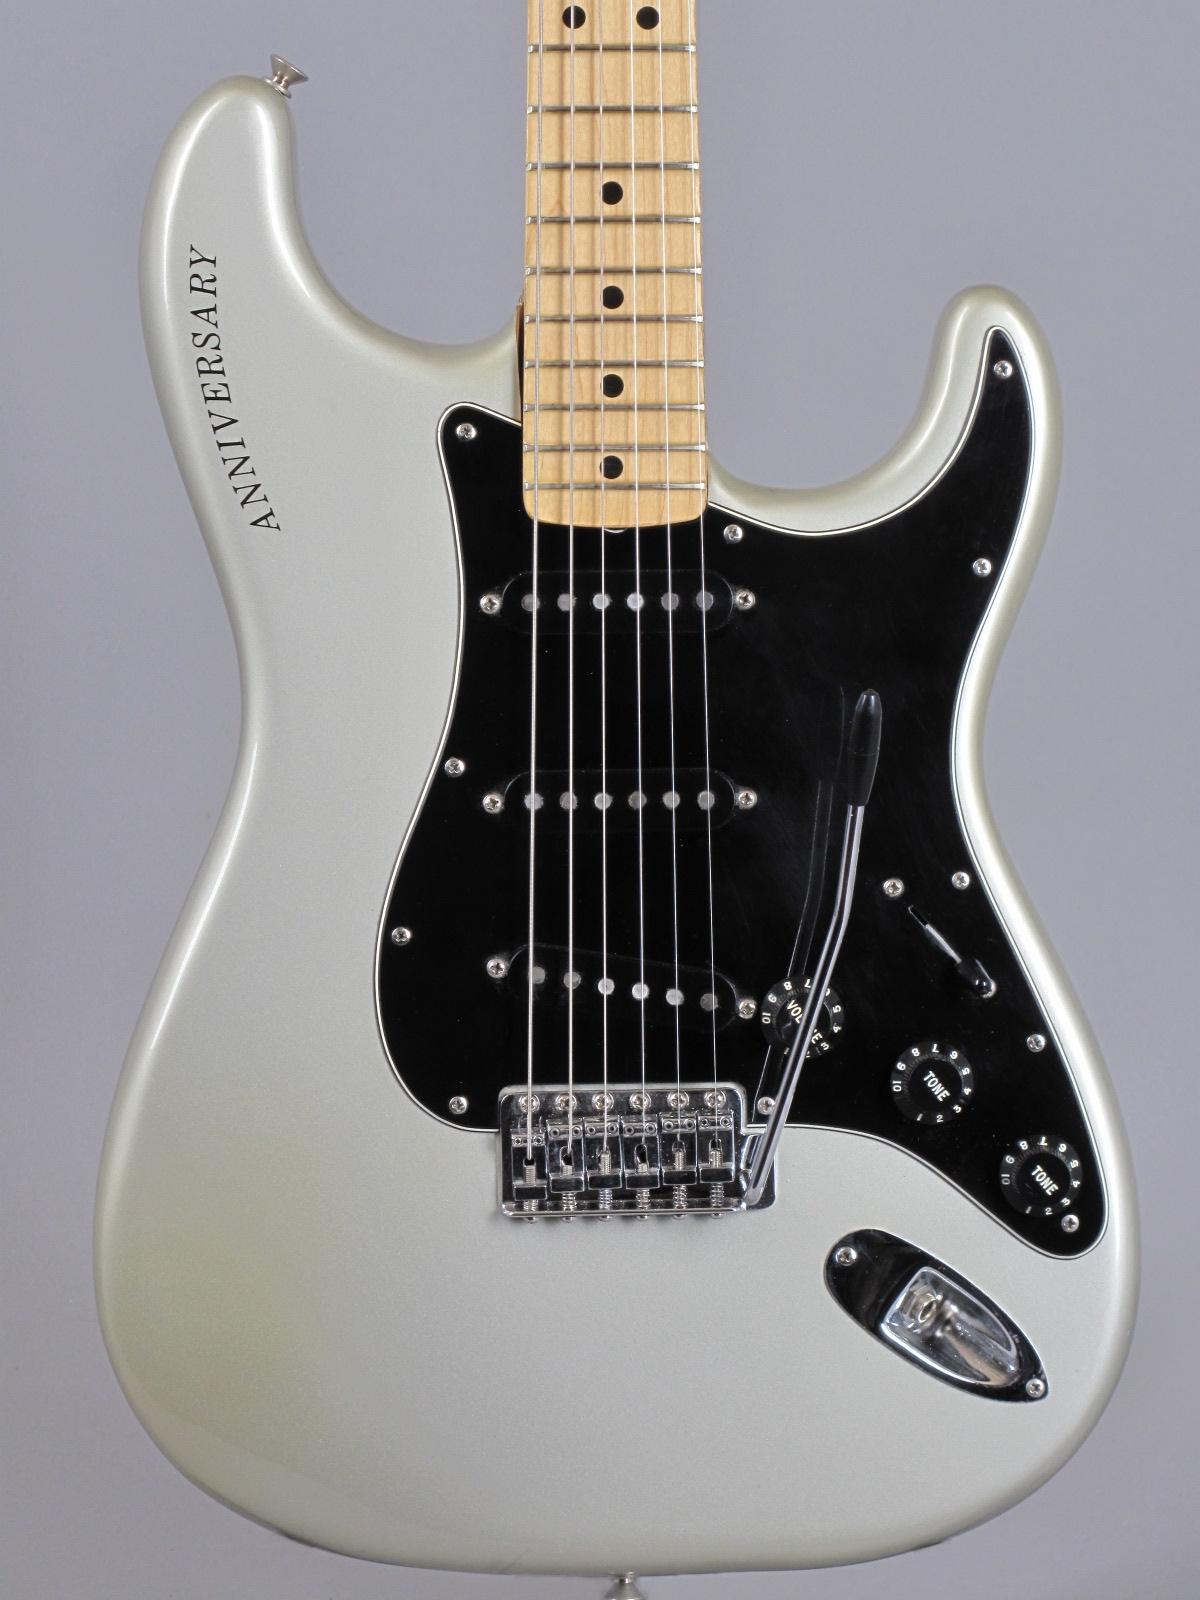 1979 Fender Stratocaster - 25th Anniversary